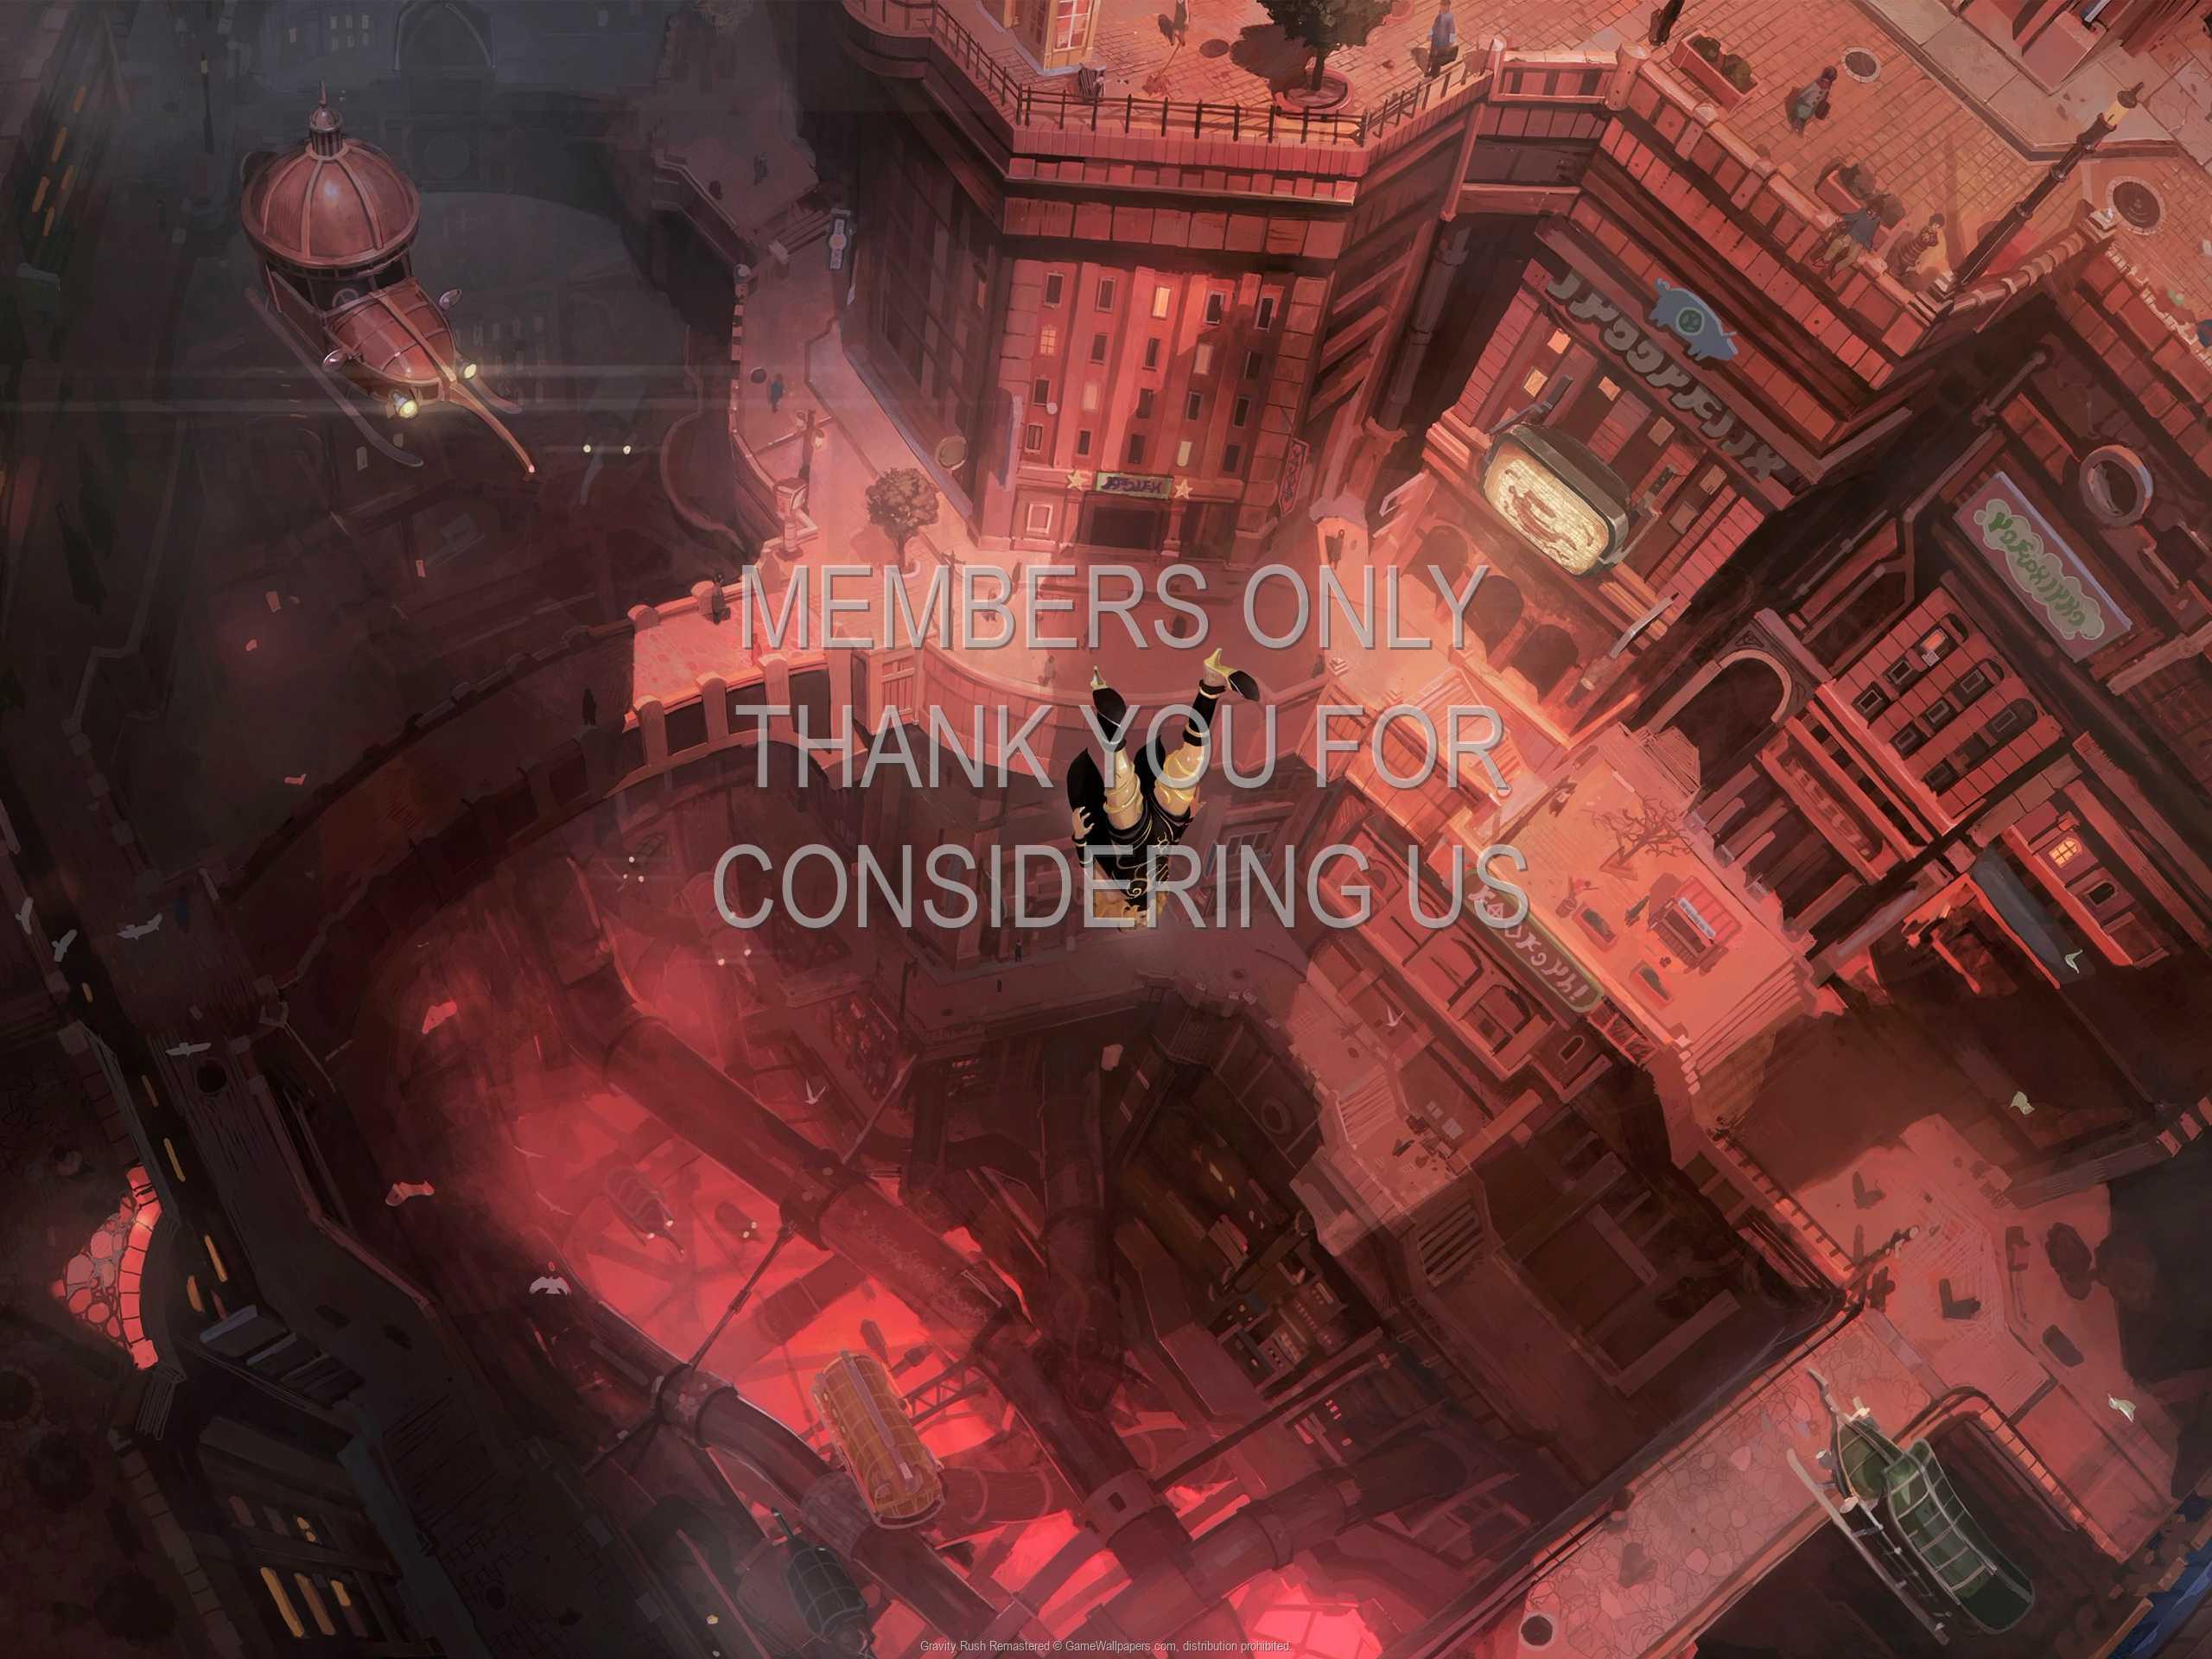 Gravity Rush Remastered 1080p Horizontal Mobile wallpaper or background 01